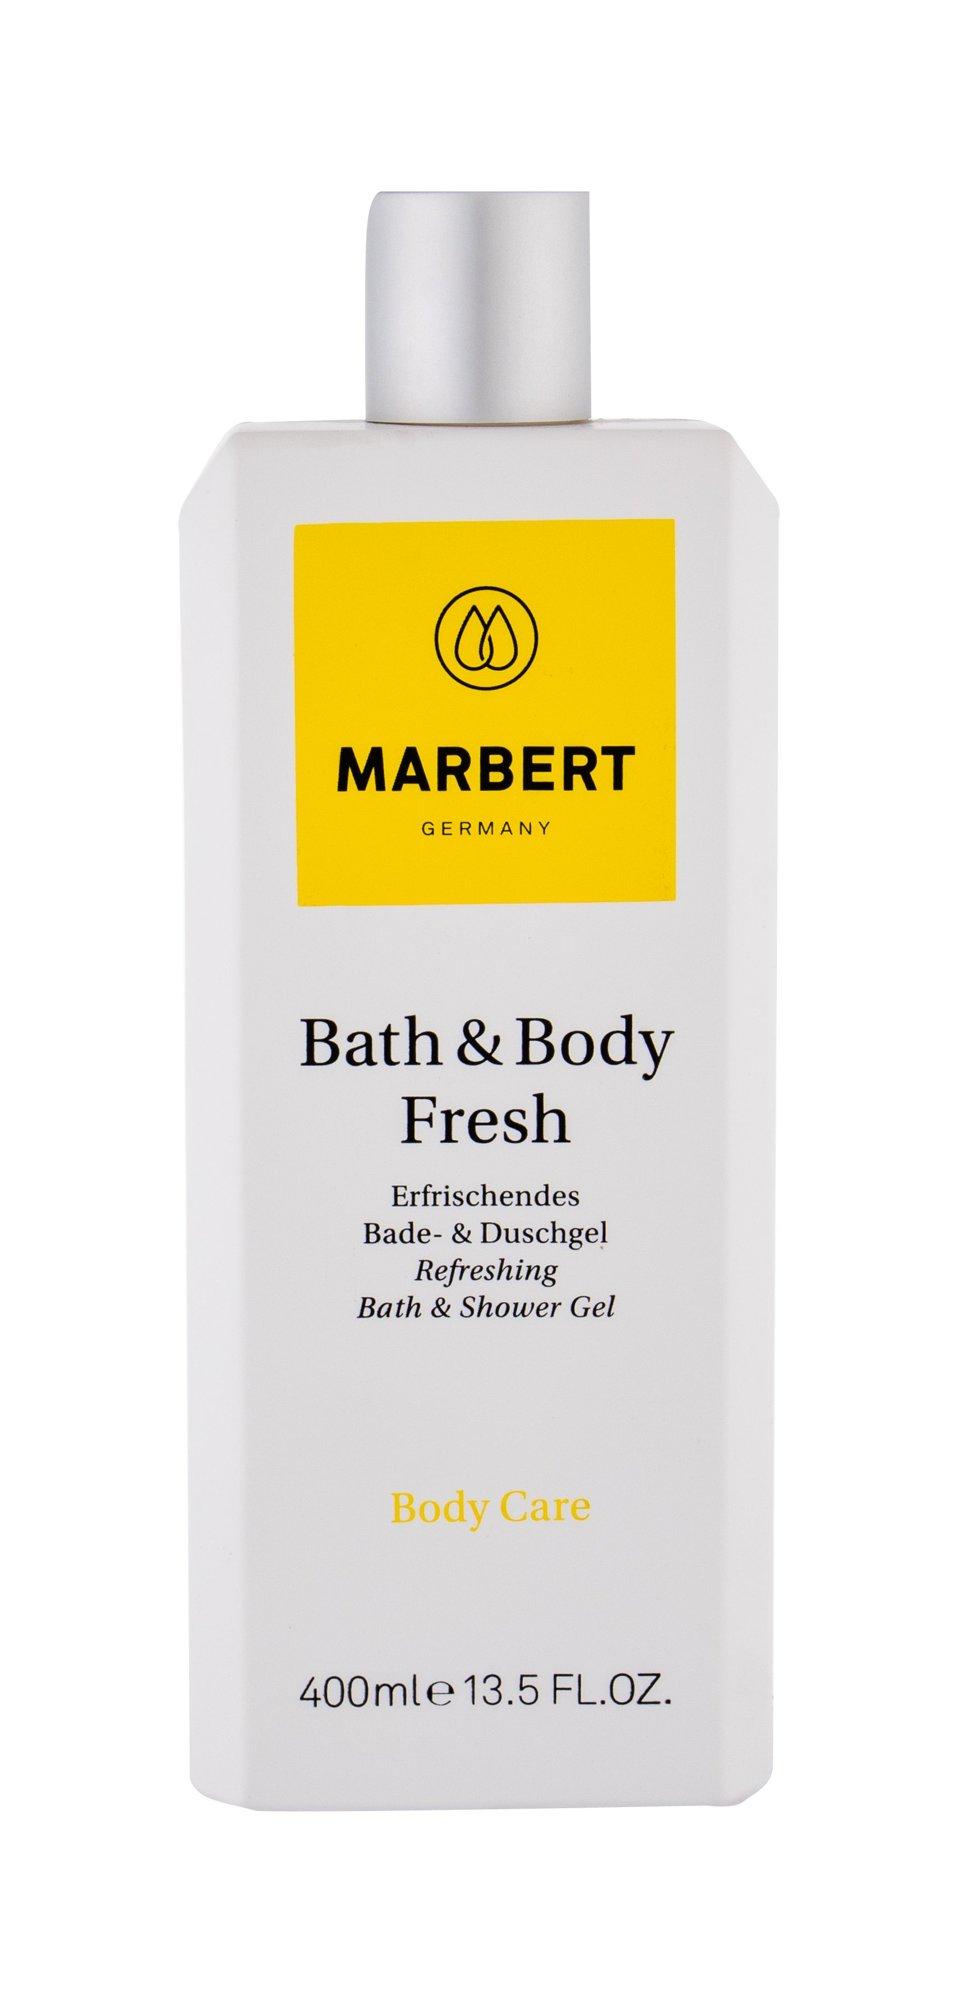 Marbert Bath & Body Fresh Shower Gel 400ml